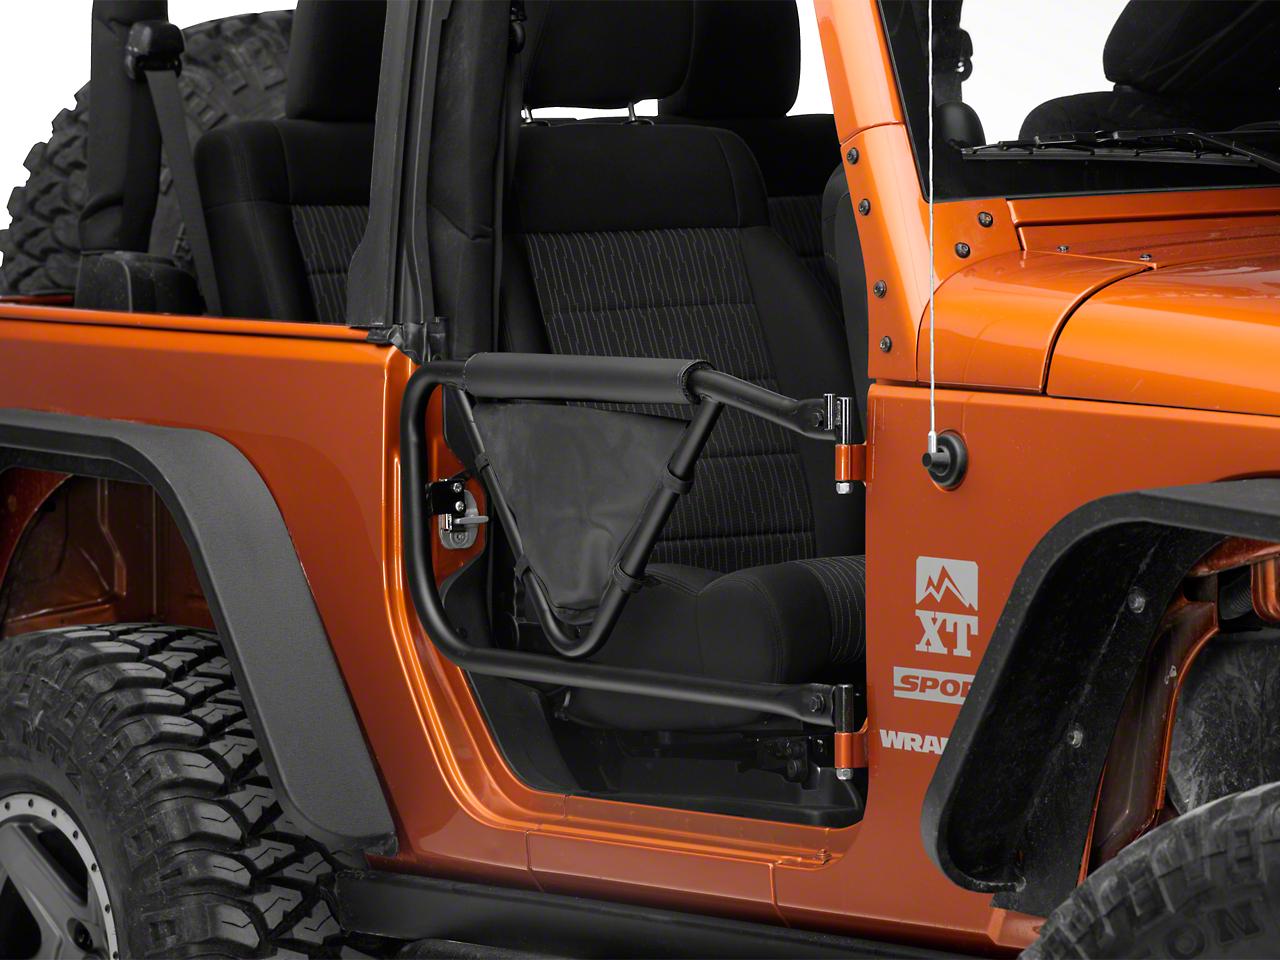 Olympic 4x4 Safari V Door with Arm Pad and Saddle Bag (07-16 Wrangler JK)